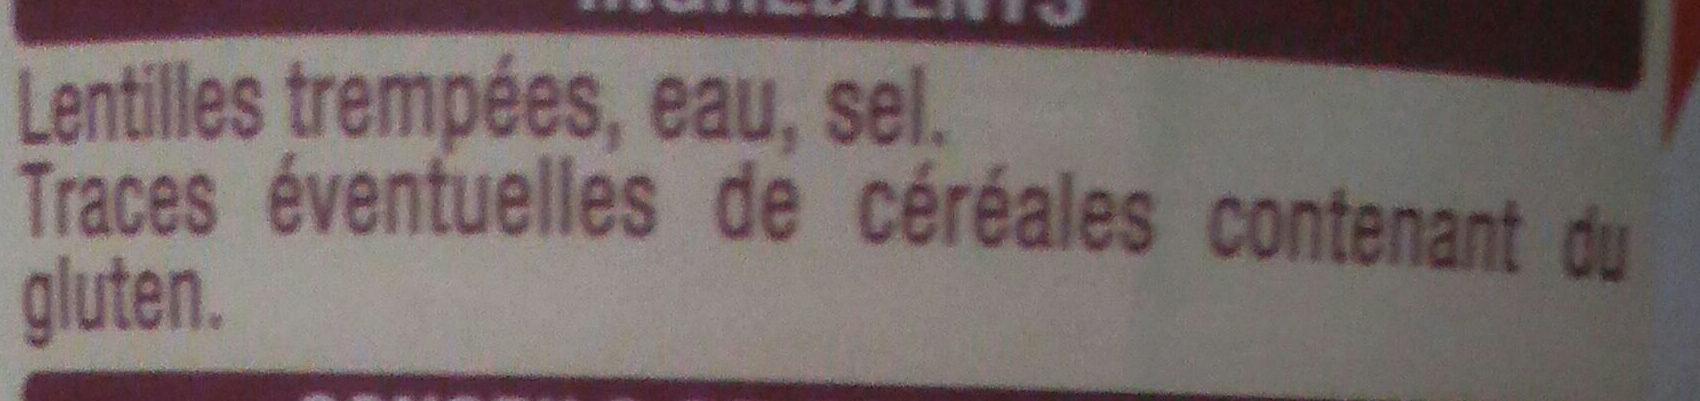 Lentilles - Ingrédients - fr